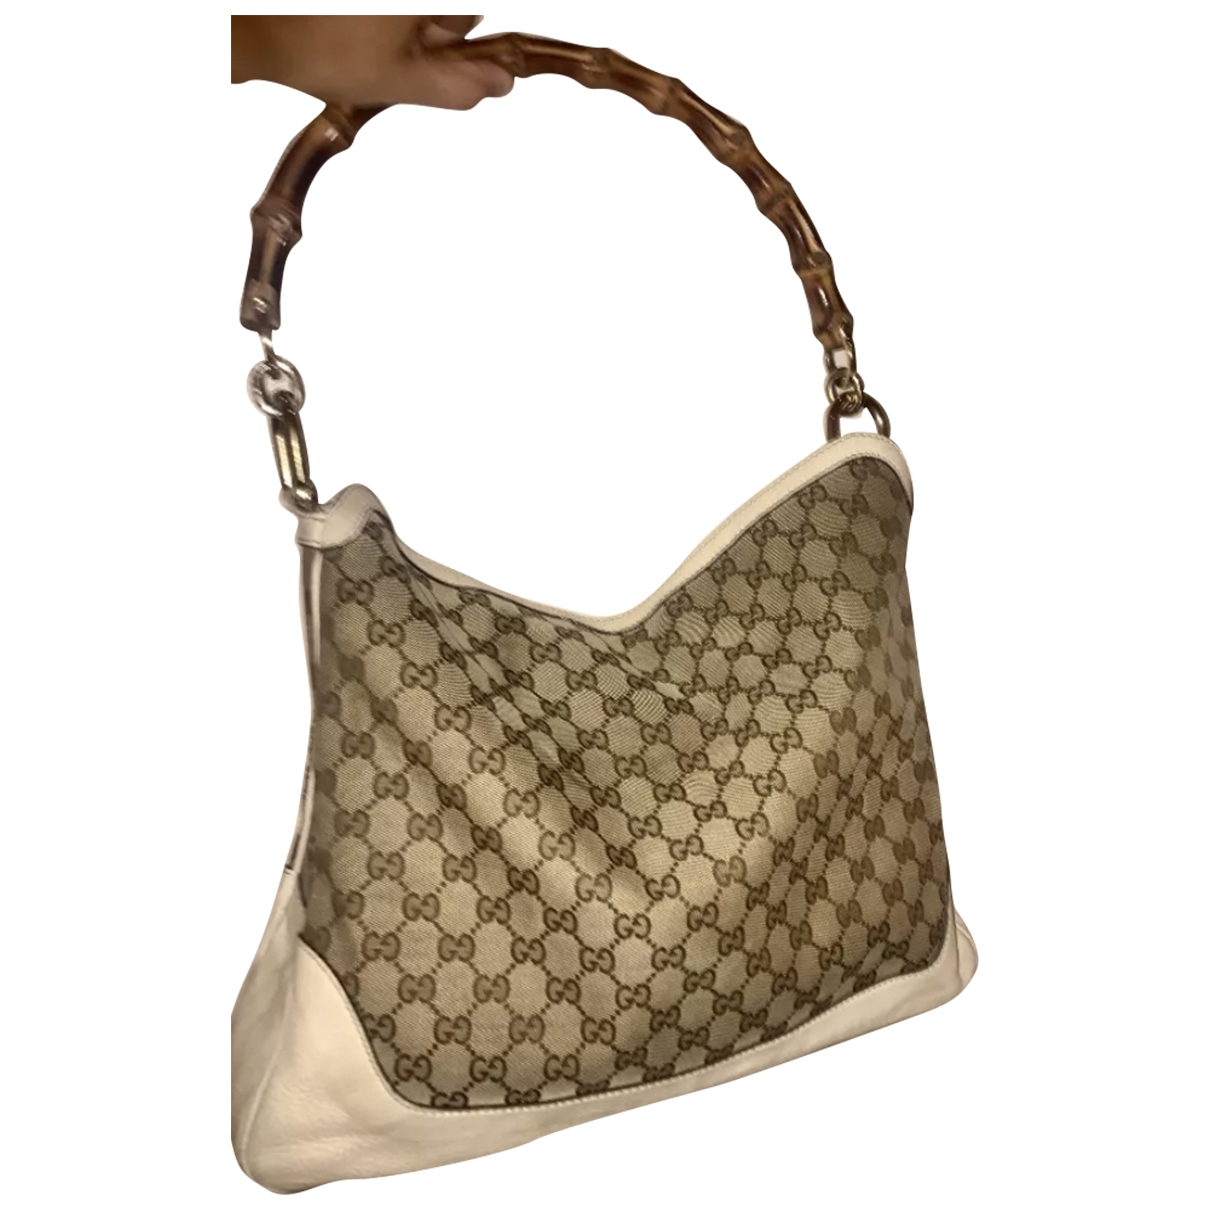 Gucci Bamboo Beige Cloth handbag for Women \N